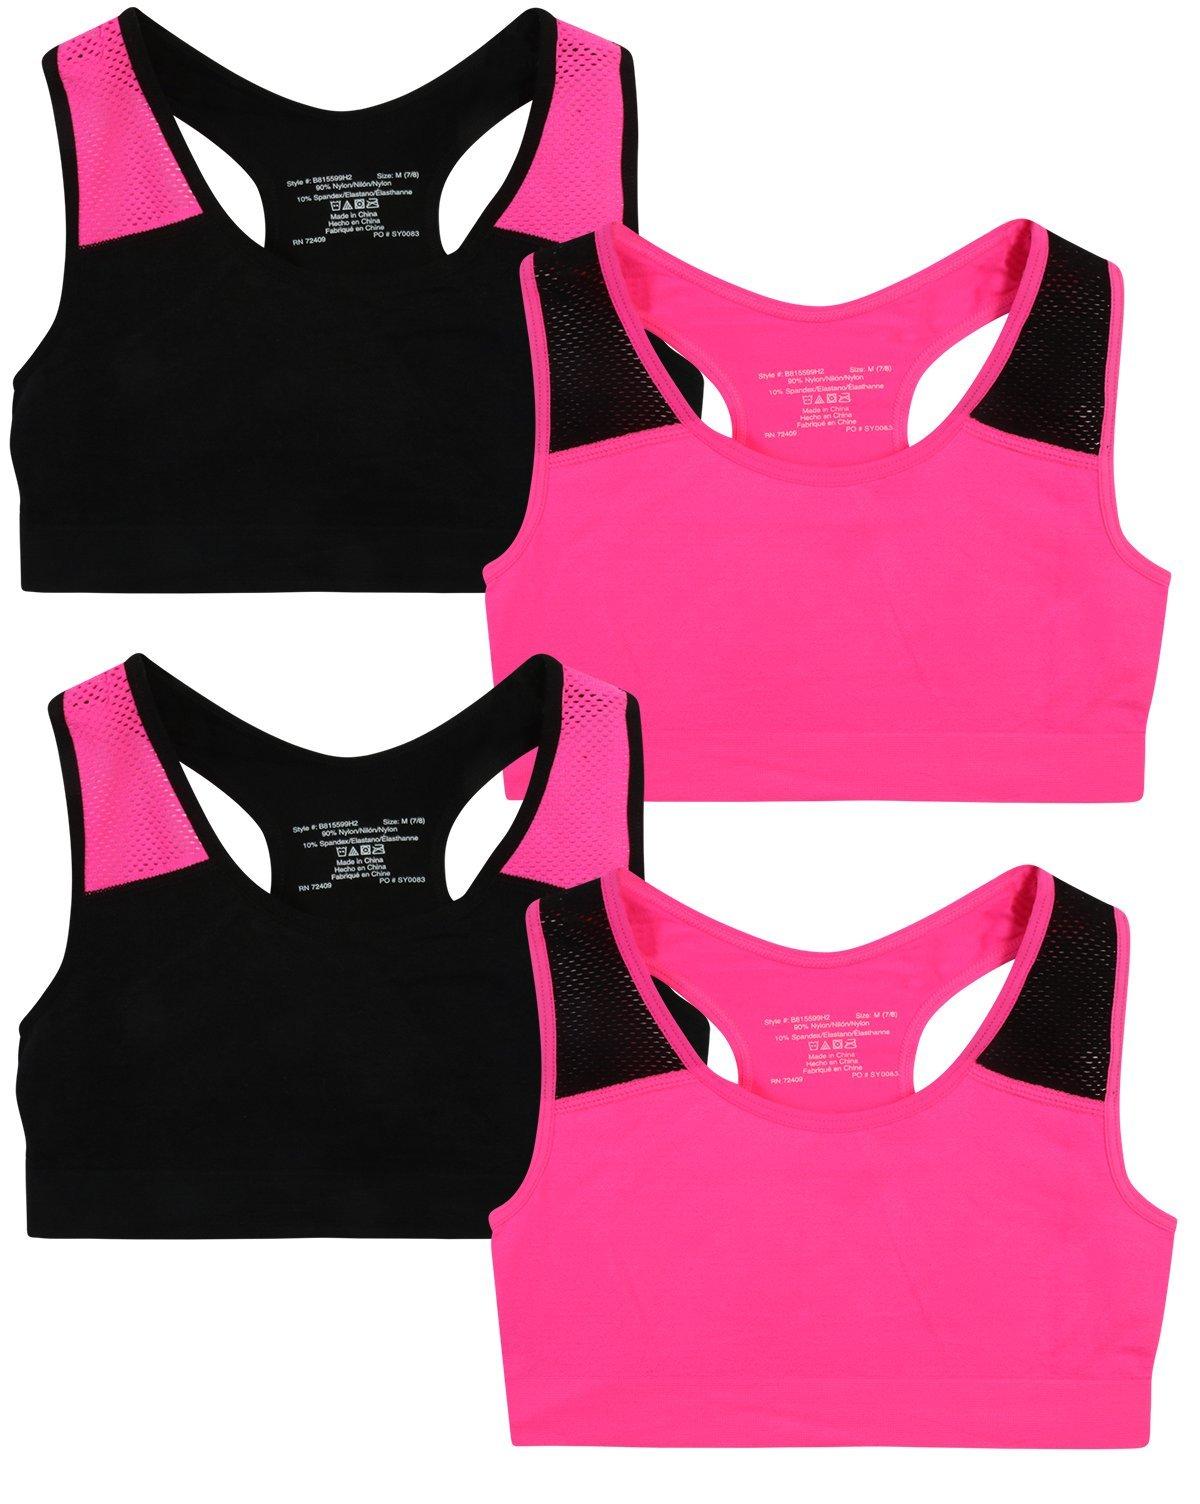 Only Girls by Rene ROFE Girl Seamless Criss Cross Racerback Sports Bra, (4 Pack) (Large - 10/12, Black/Pink)'